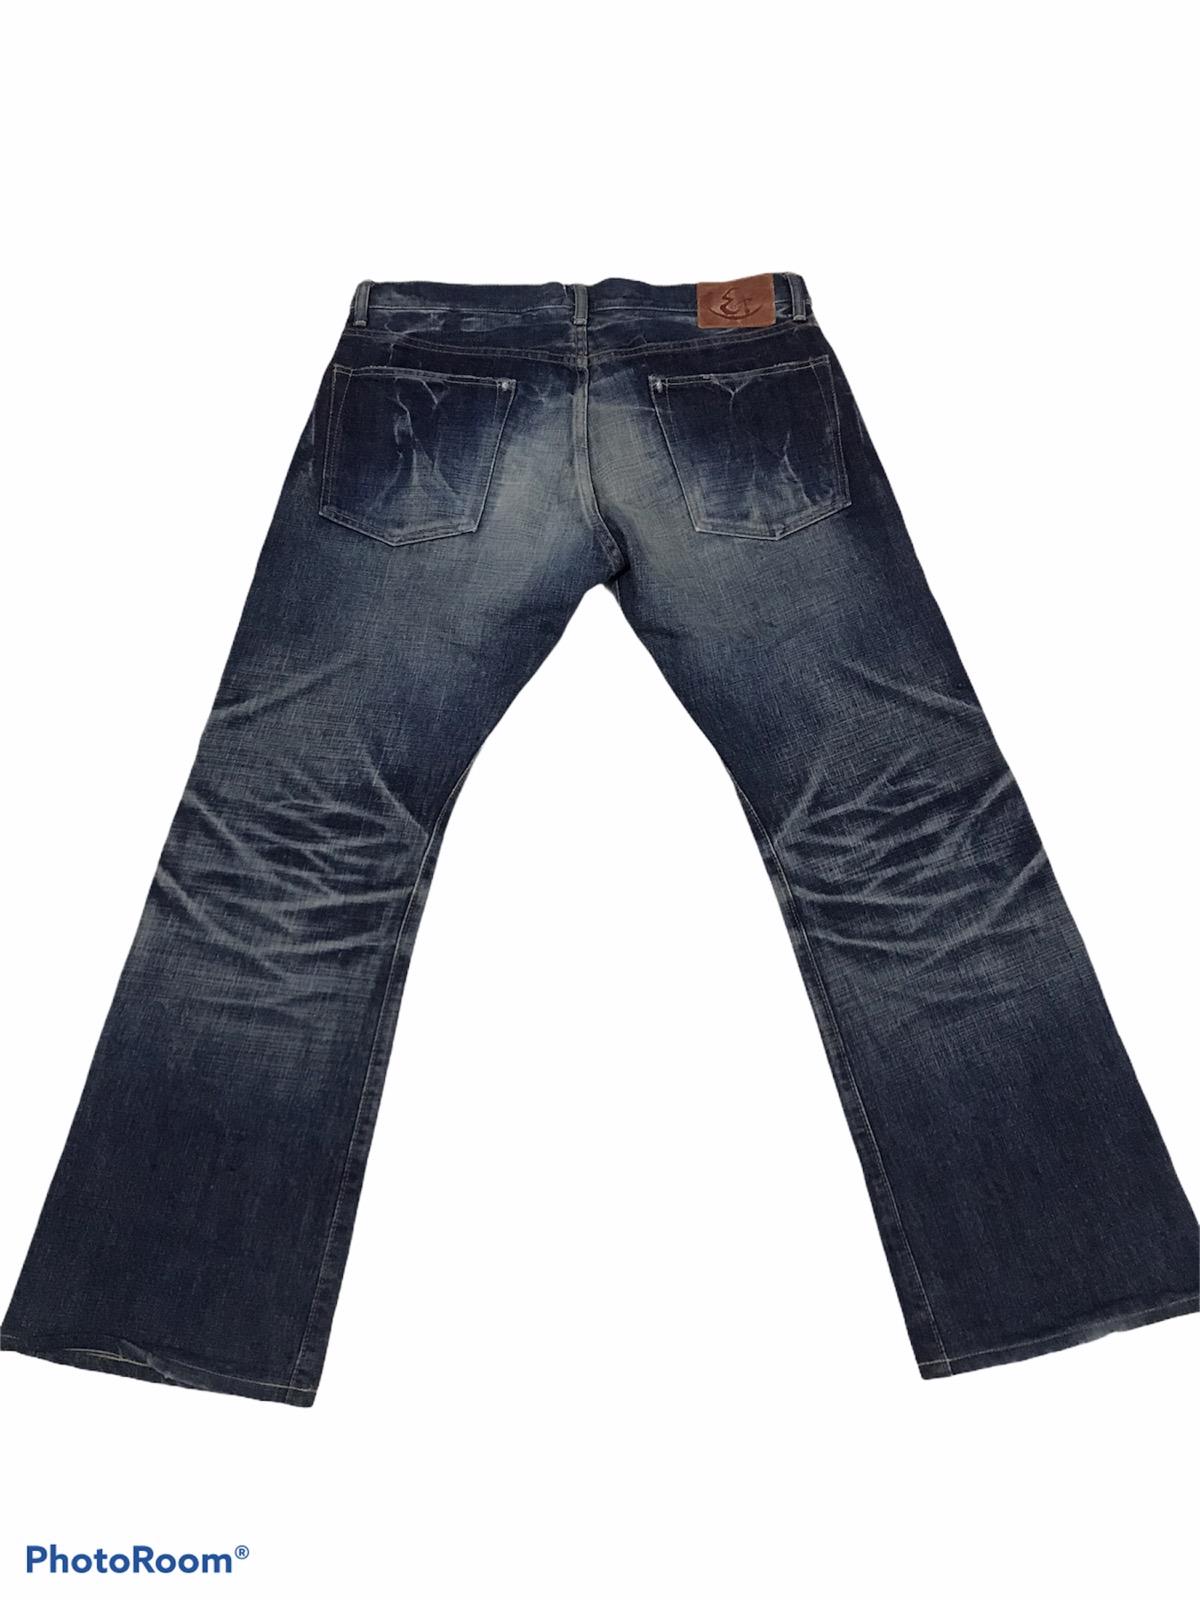 Japanese Brand Eternal Distressed Pant Size 33